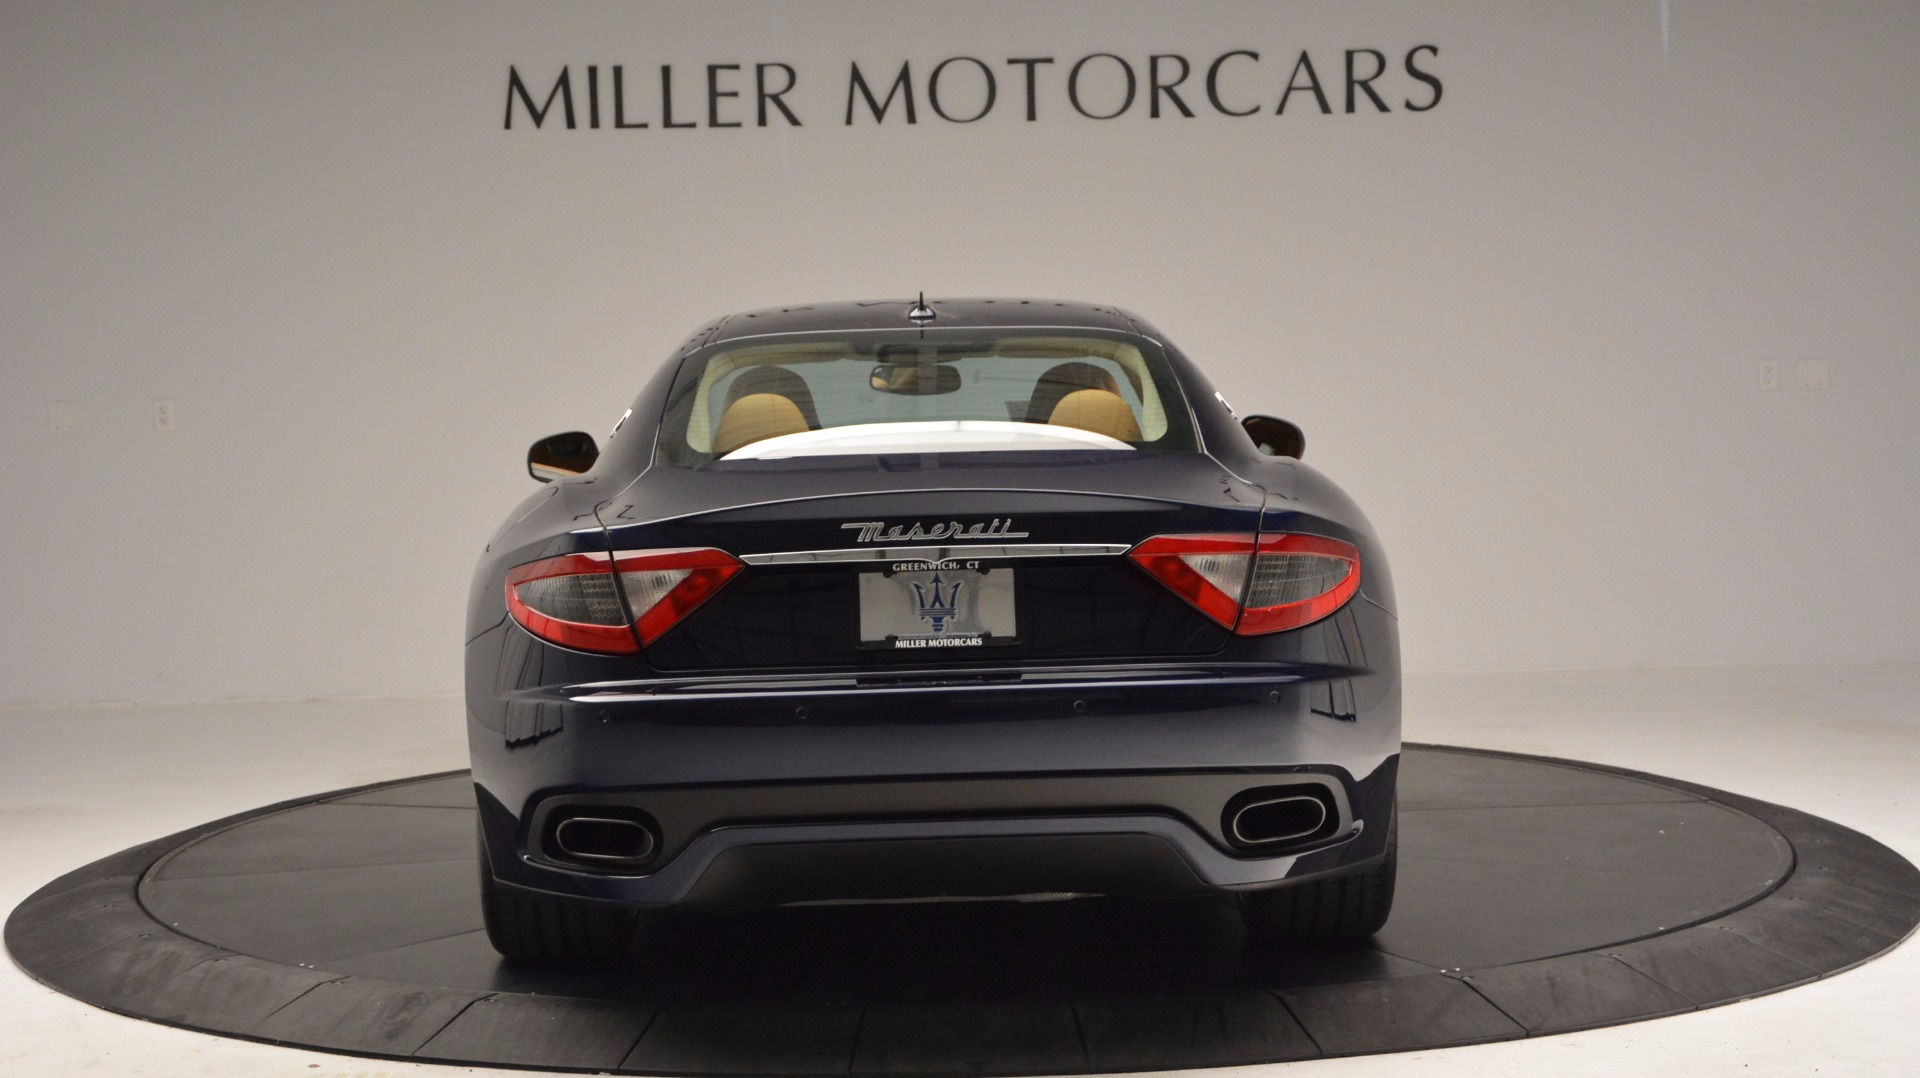 New 2017 Maserati GranTurismo Coupe Sport For Sale In Westport, CT 1295_p6